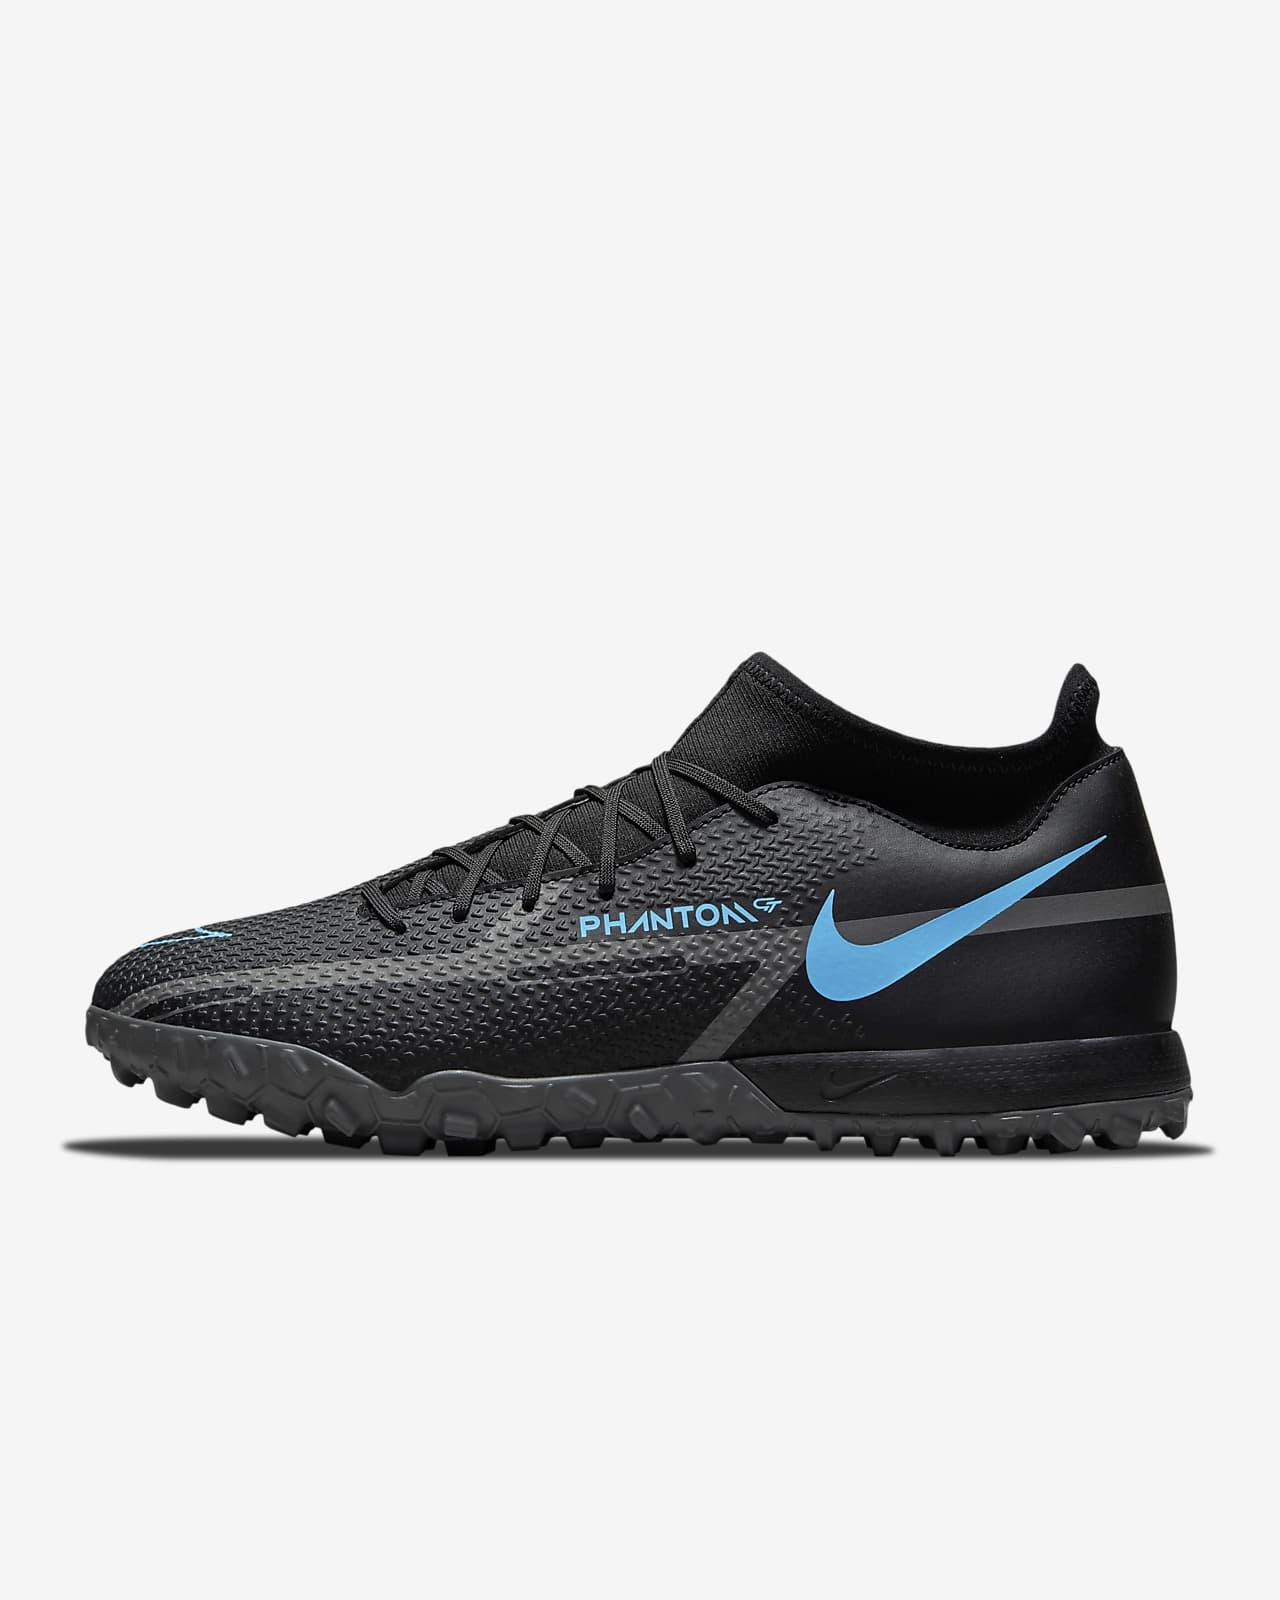 Nike Phantom GT2 Academy Dynamic Fit TF Turf Football Shoe